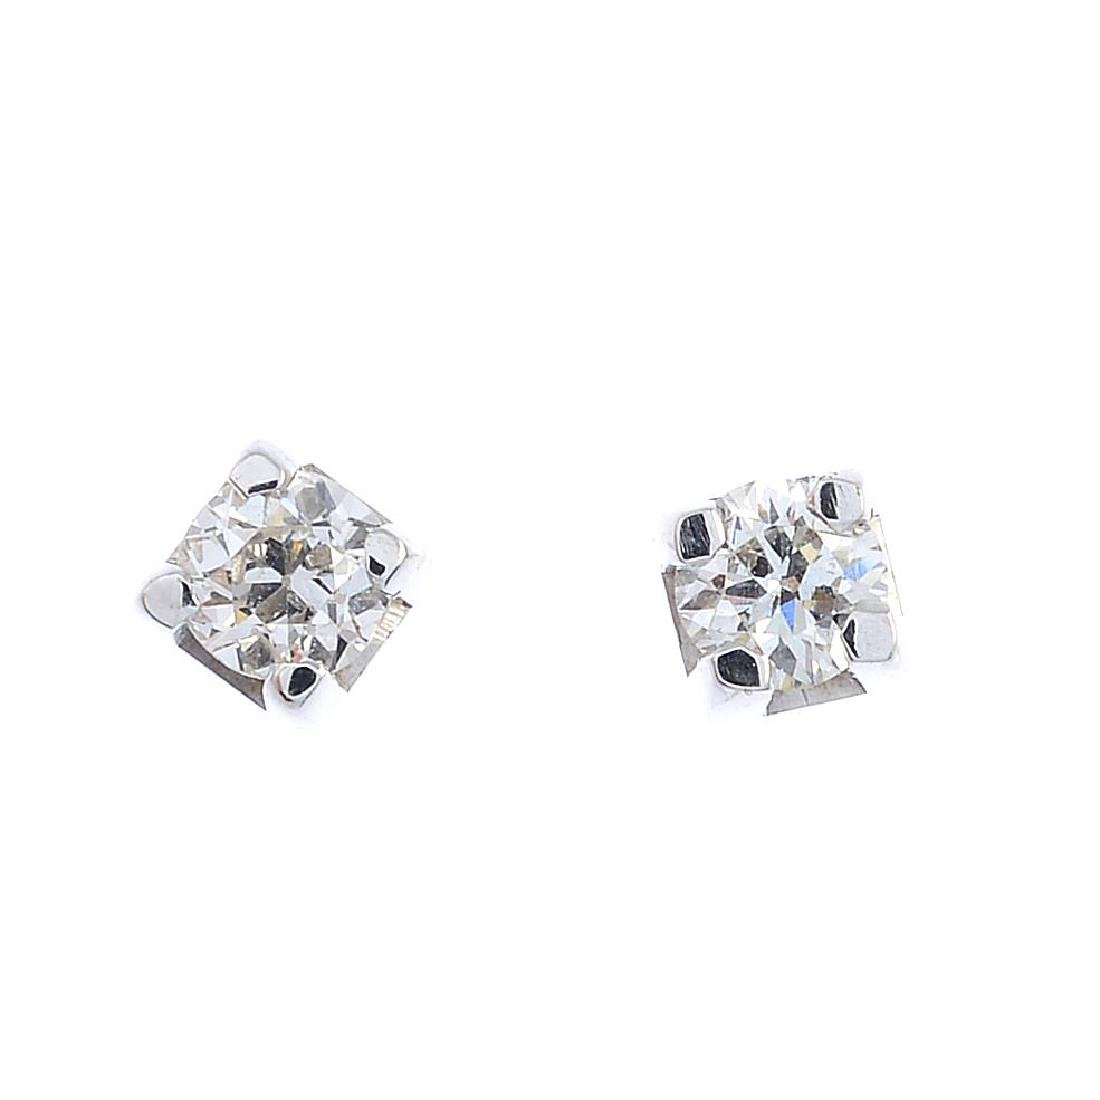 A pair of 18ct gold brilliant-cut diamond stud